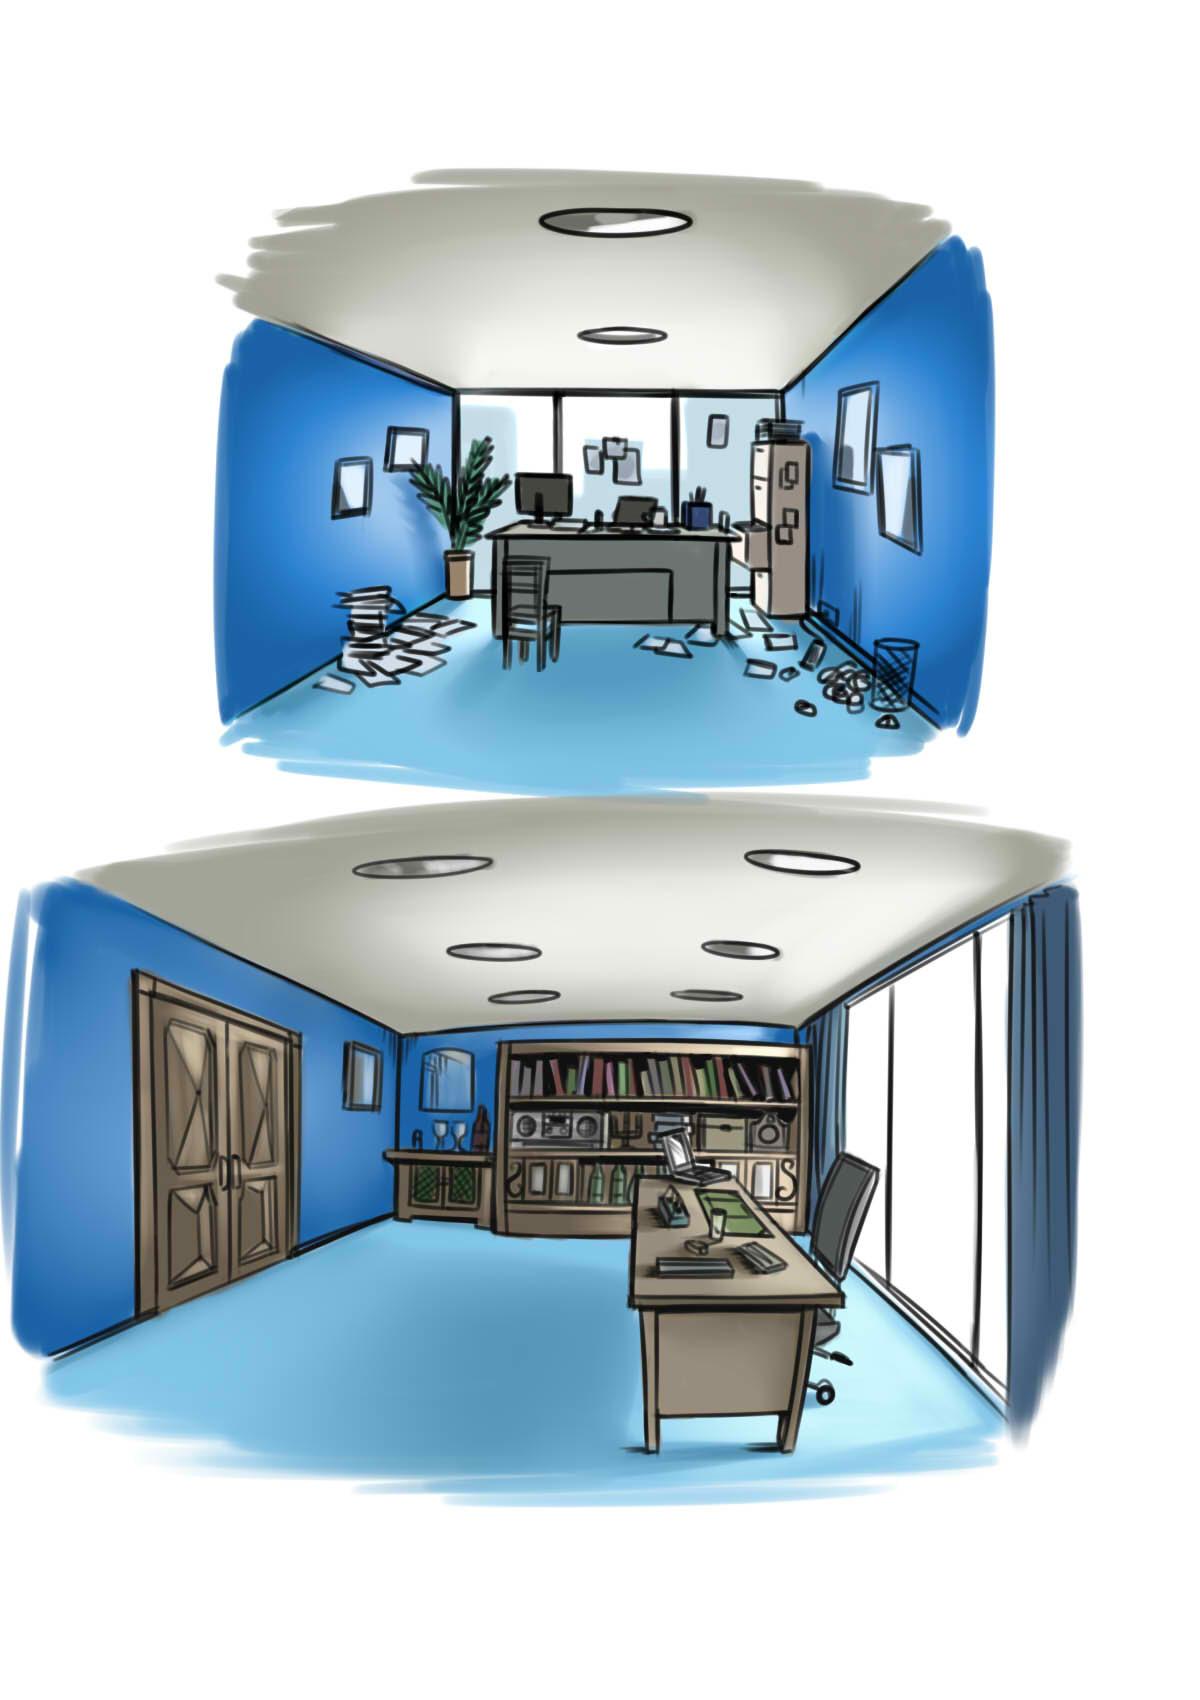 Steven galvan office concept art